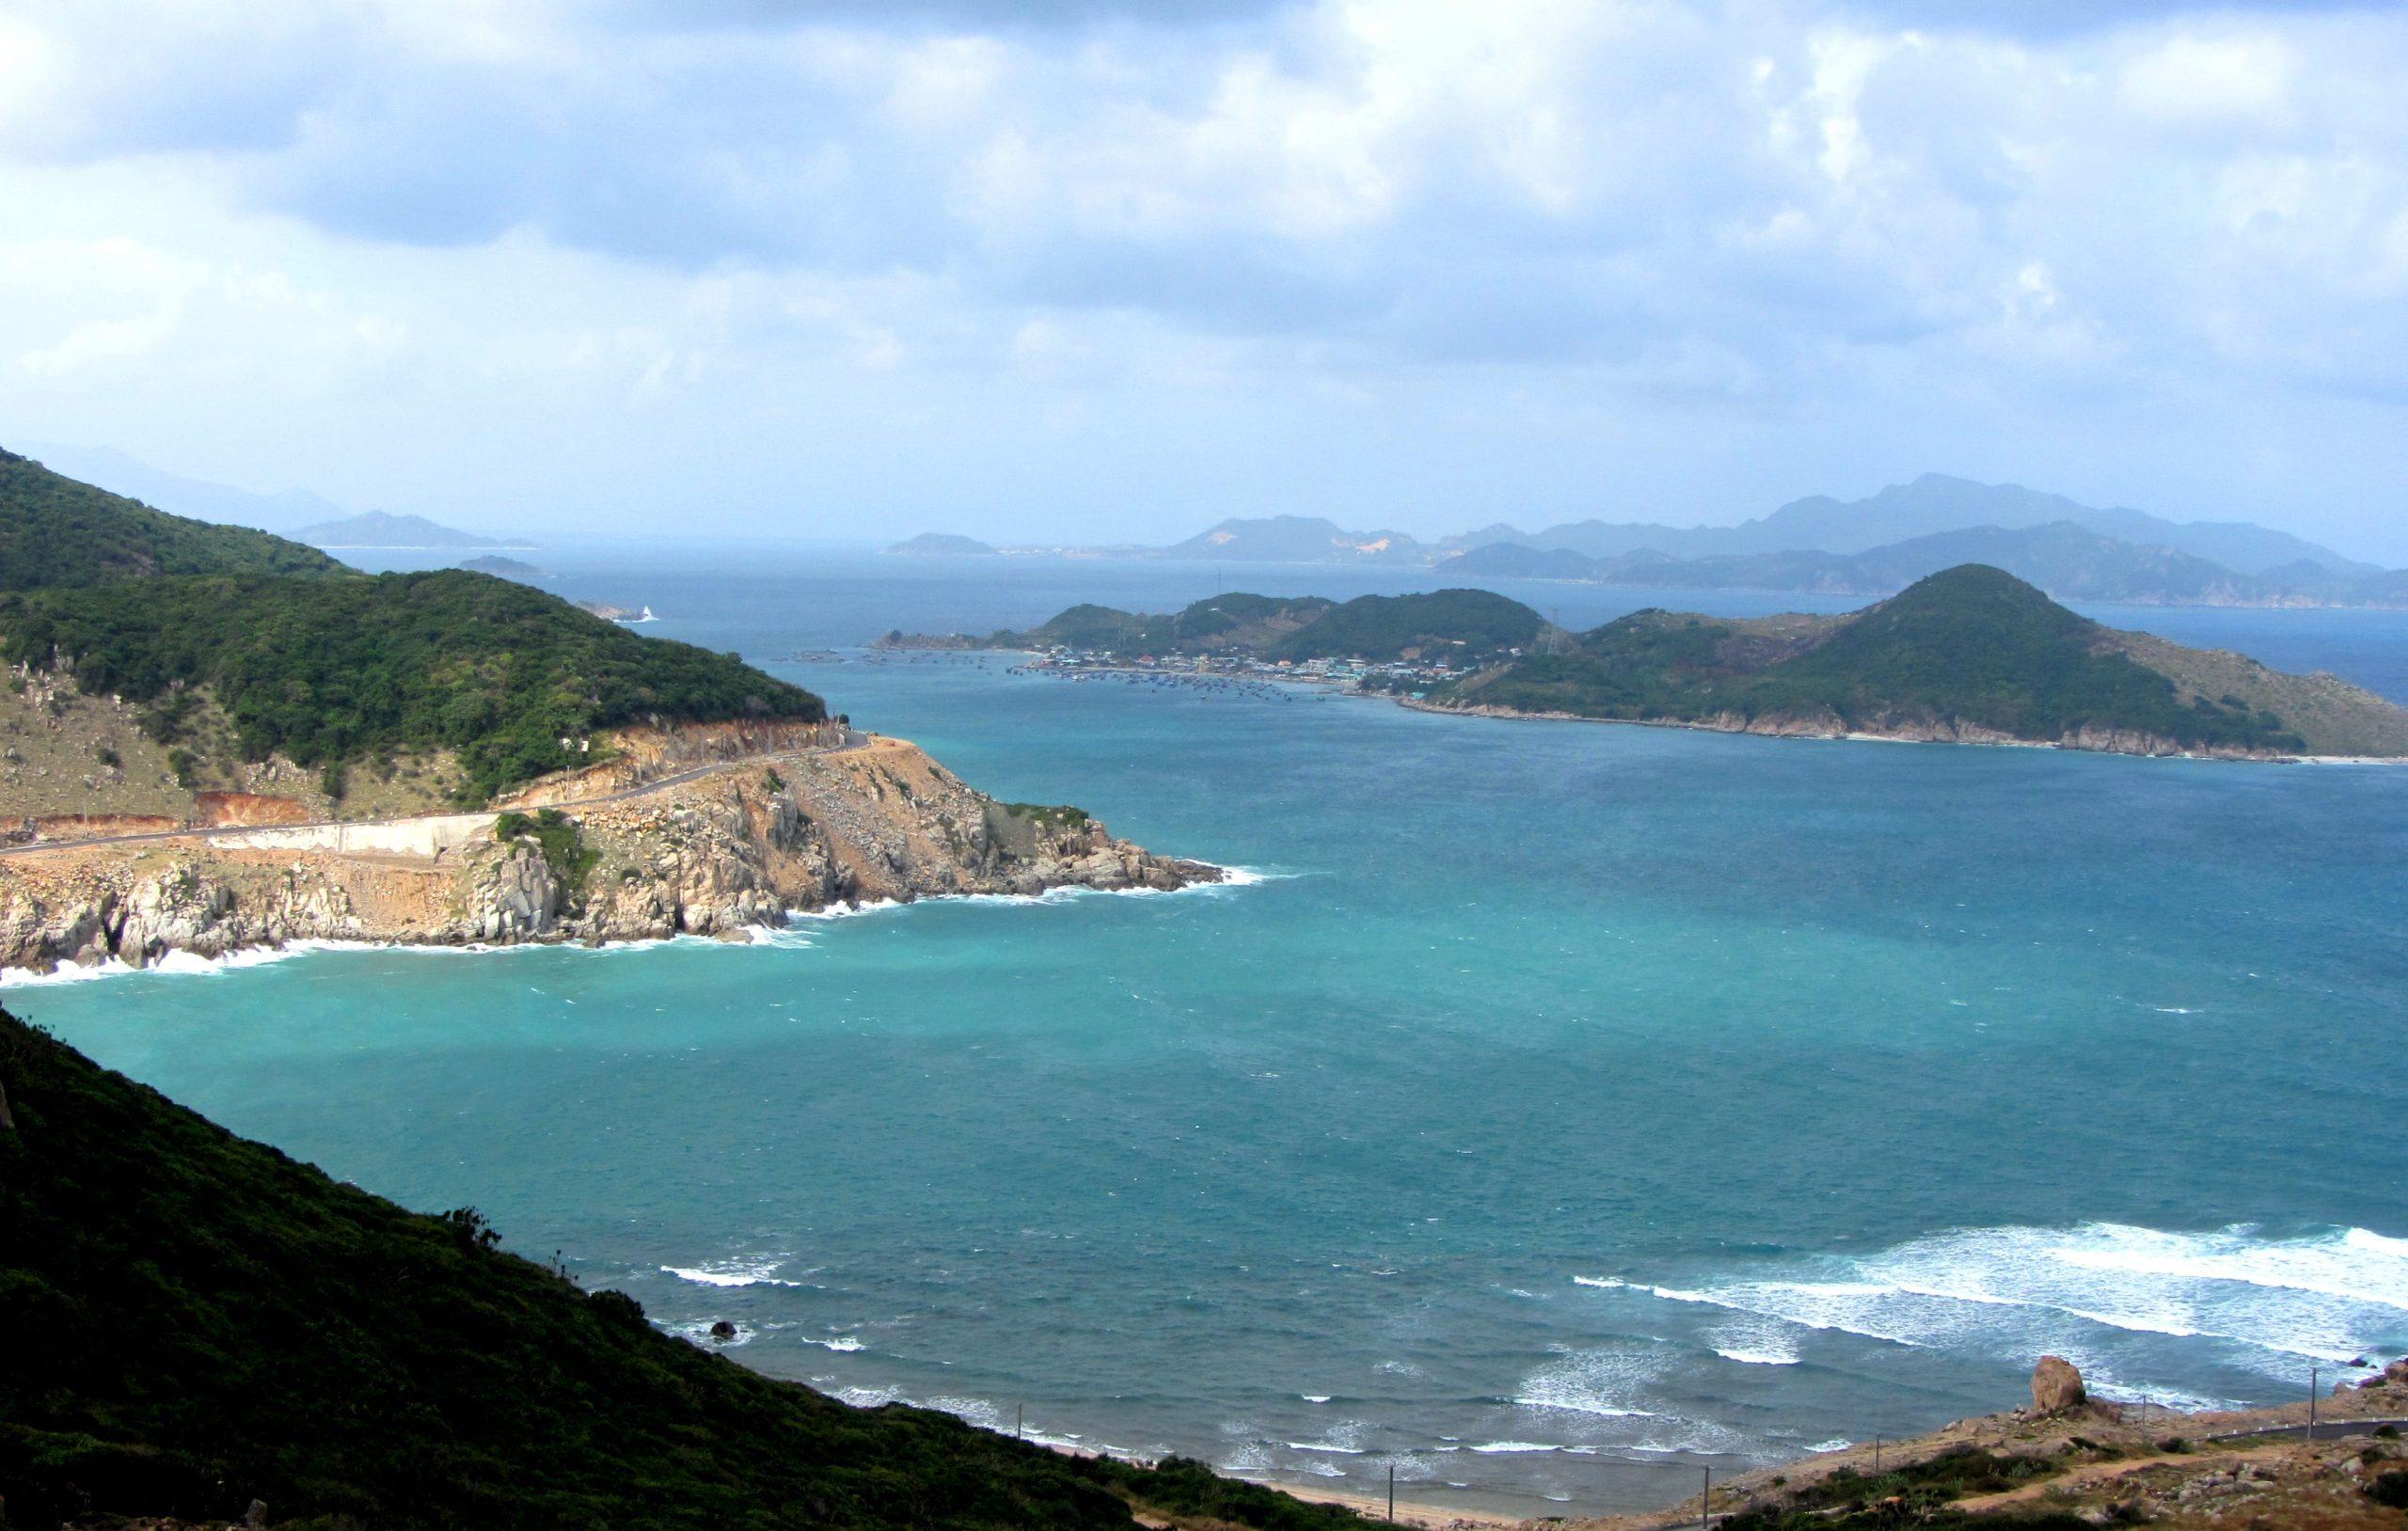 Núi Chúa Coastal Road